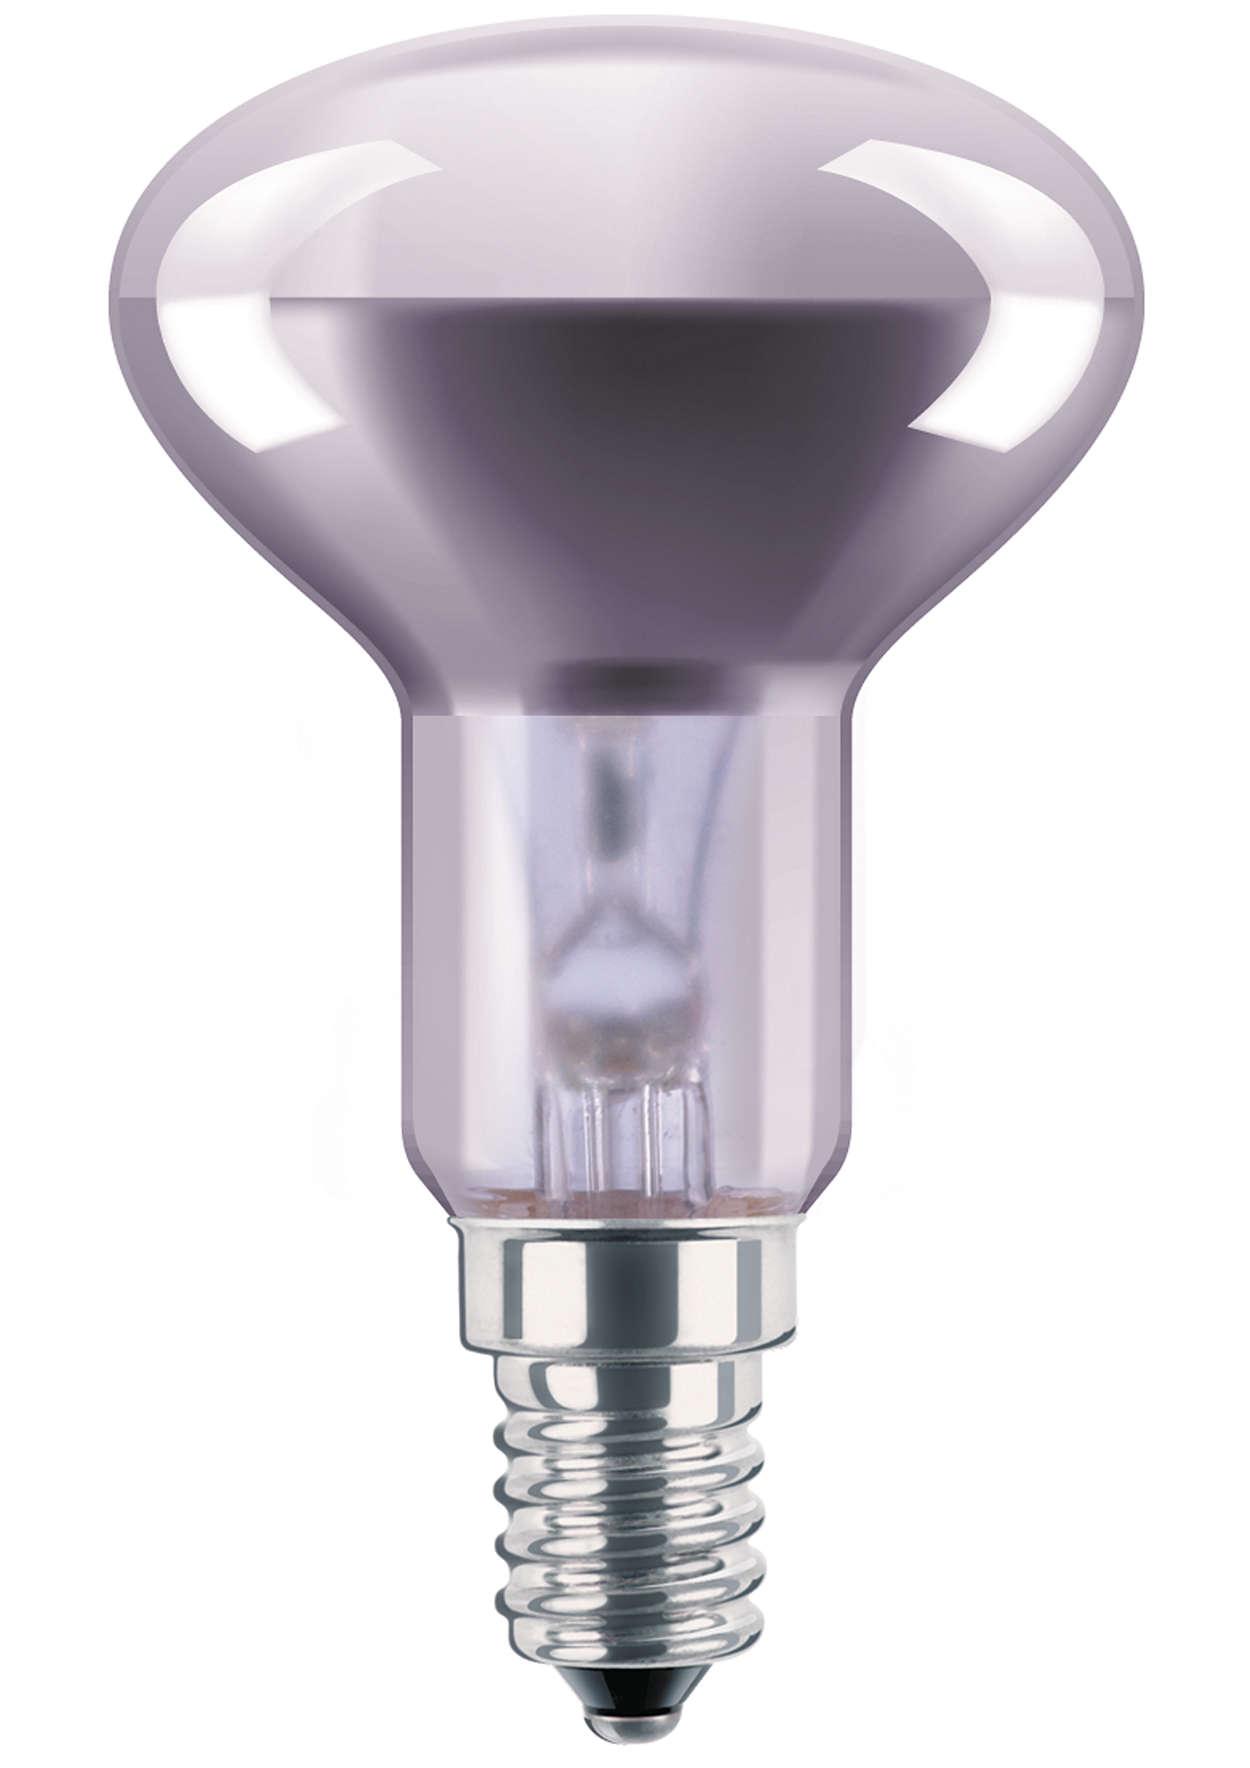 Neodyymilampulla varustettu heijastinlamppu